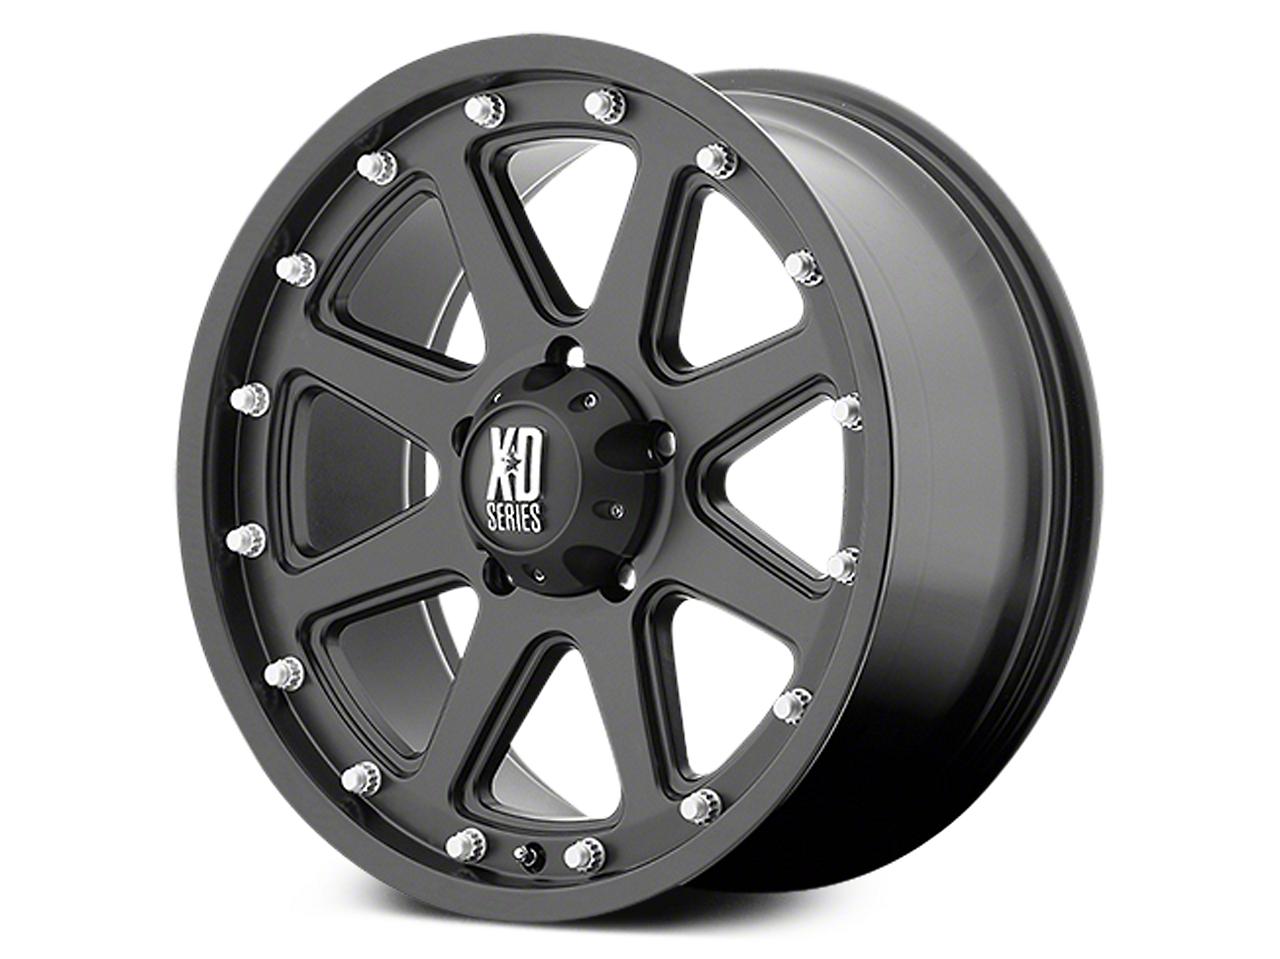 XD Addict Matte Black 6-Lug Wheel - 18x9 (07-18 Sierra 1500)